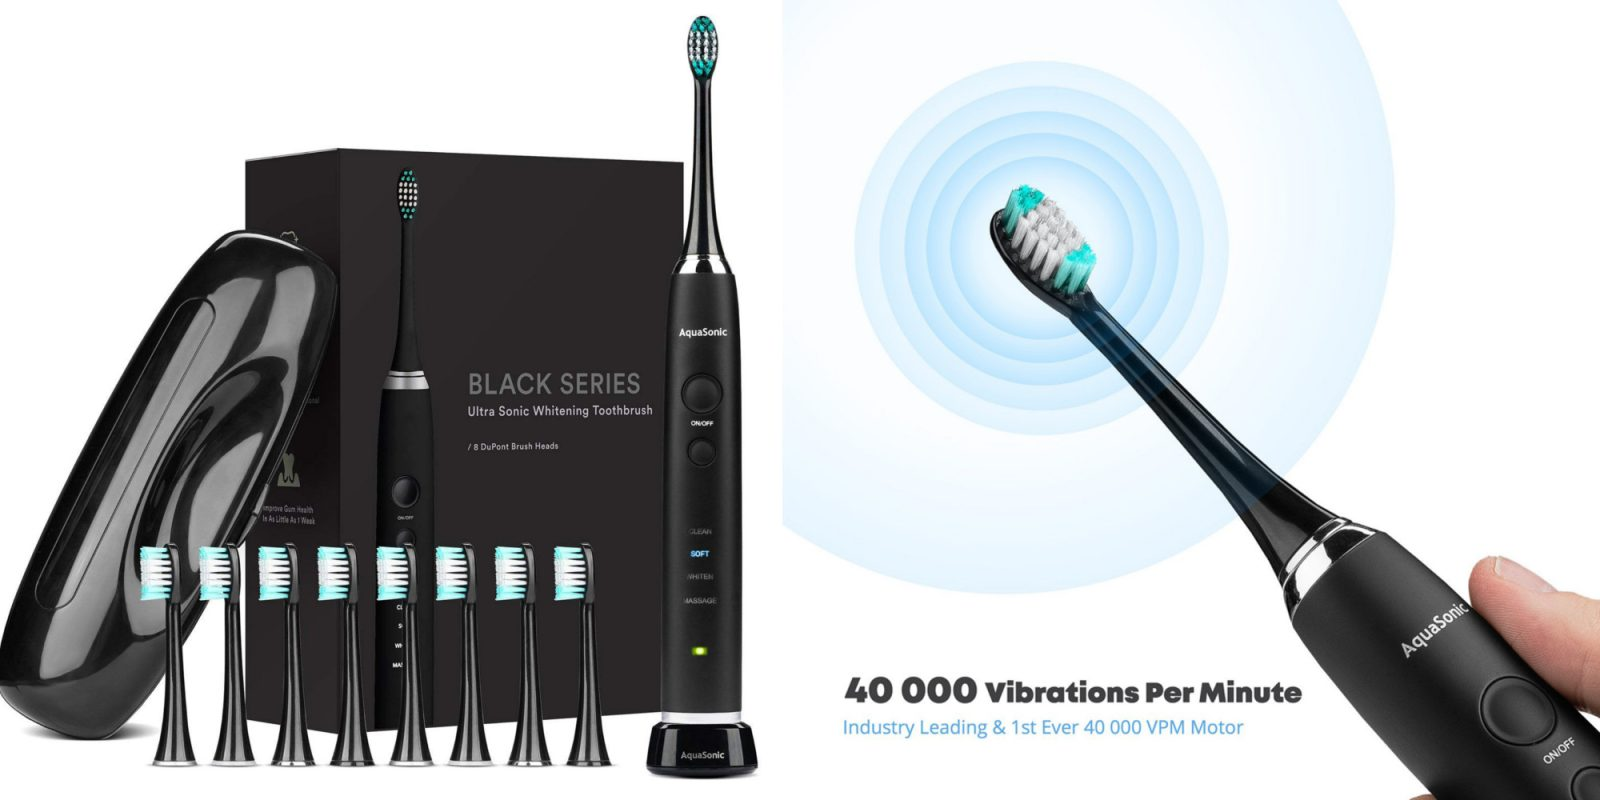 AquaSonic Black Series Ultra Whitening Electric Toothbrush